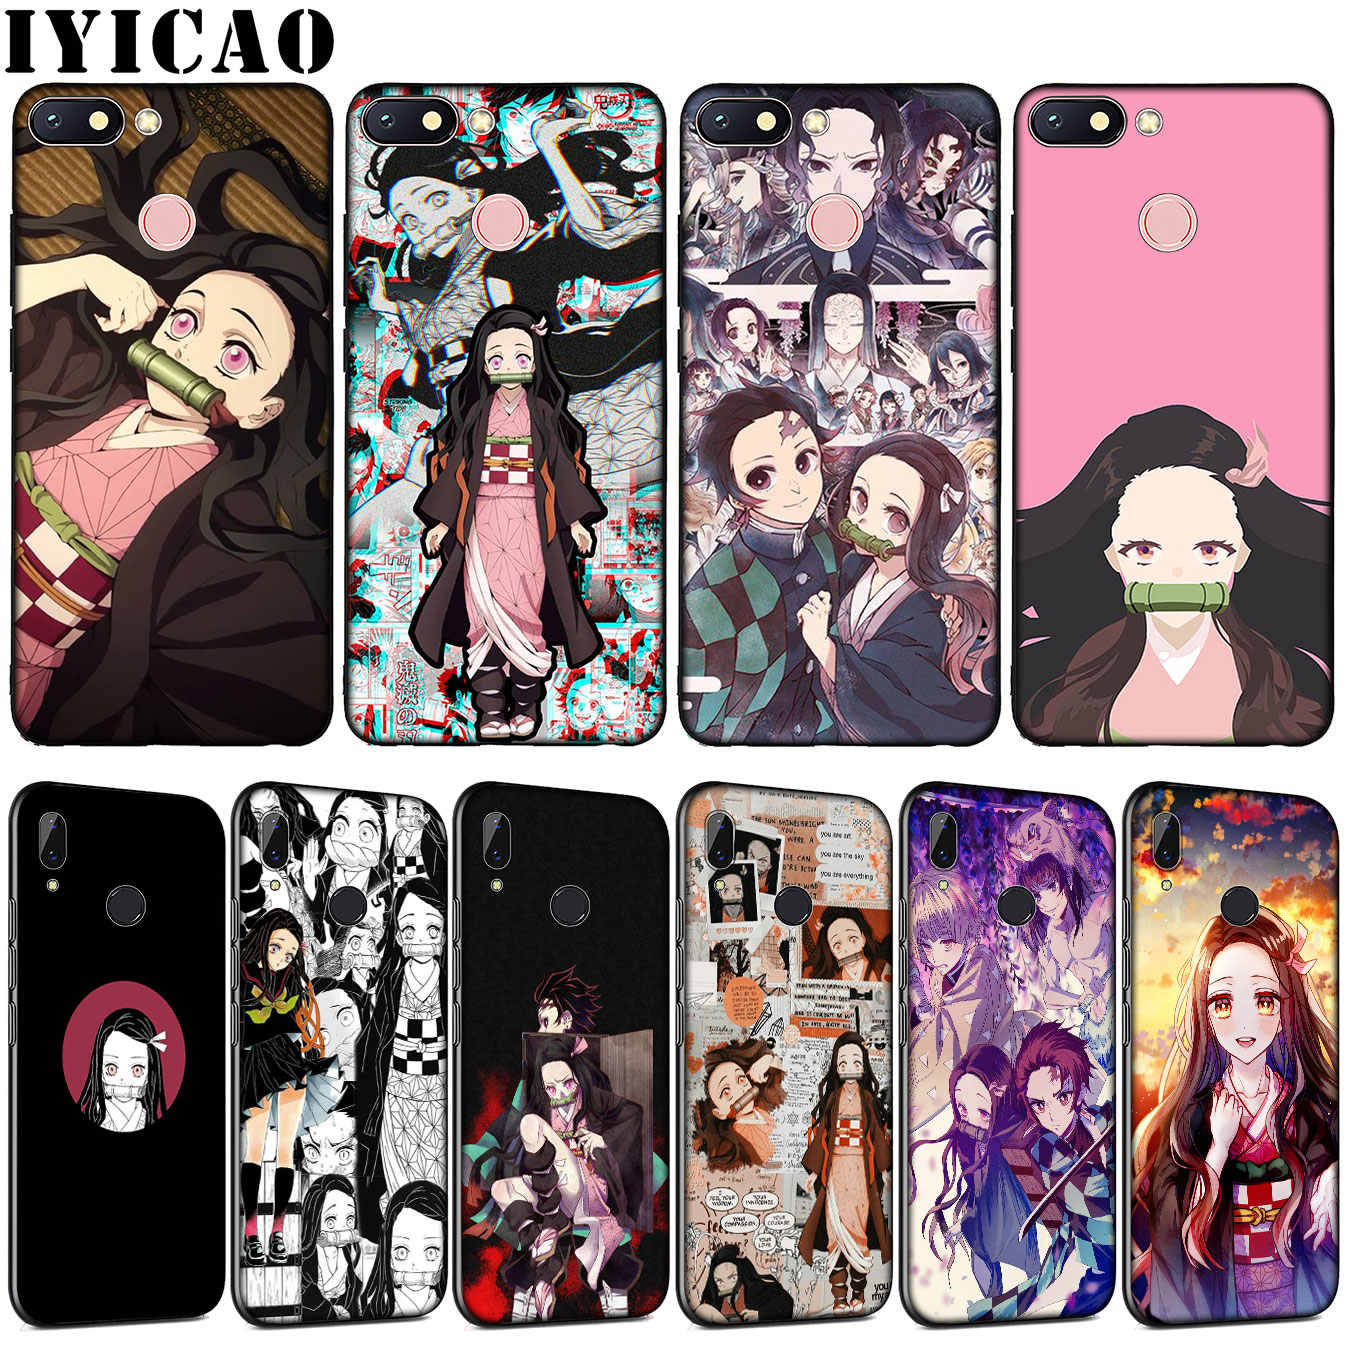 Funda Nezuko Demon Slayer, bonita y suave funda de teléfono para Xiaomi de silicona TPU para Redmi Note 8 8A 8T 7 7A 6 6A 5 5A GO S2 K30 K20 Pro